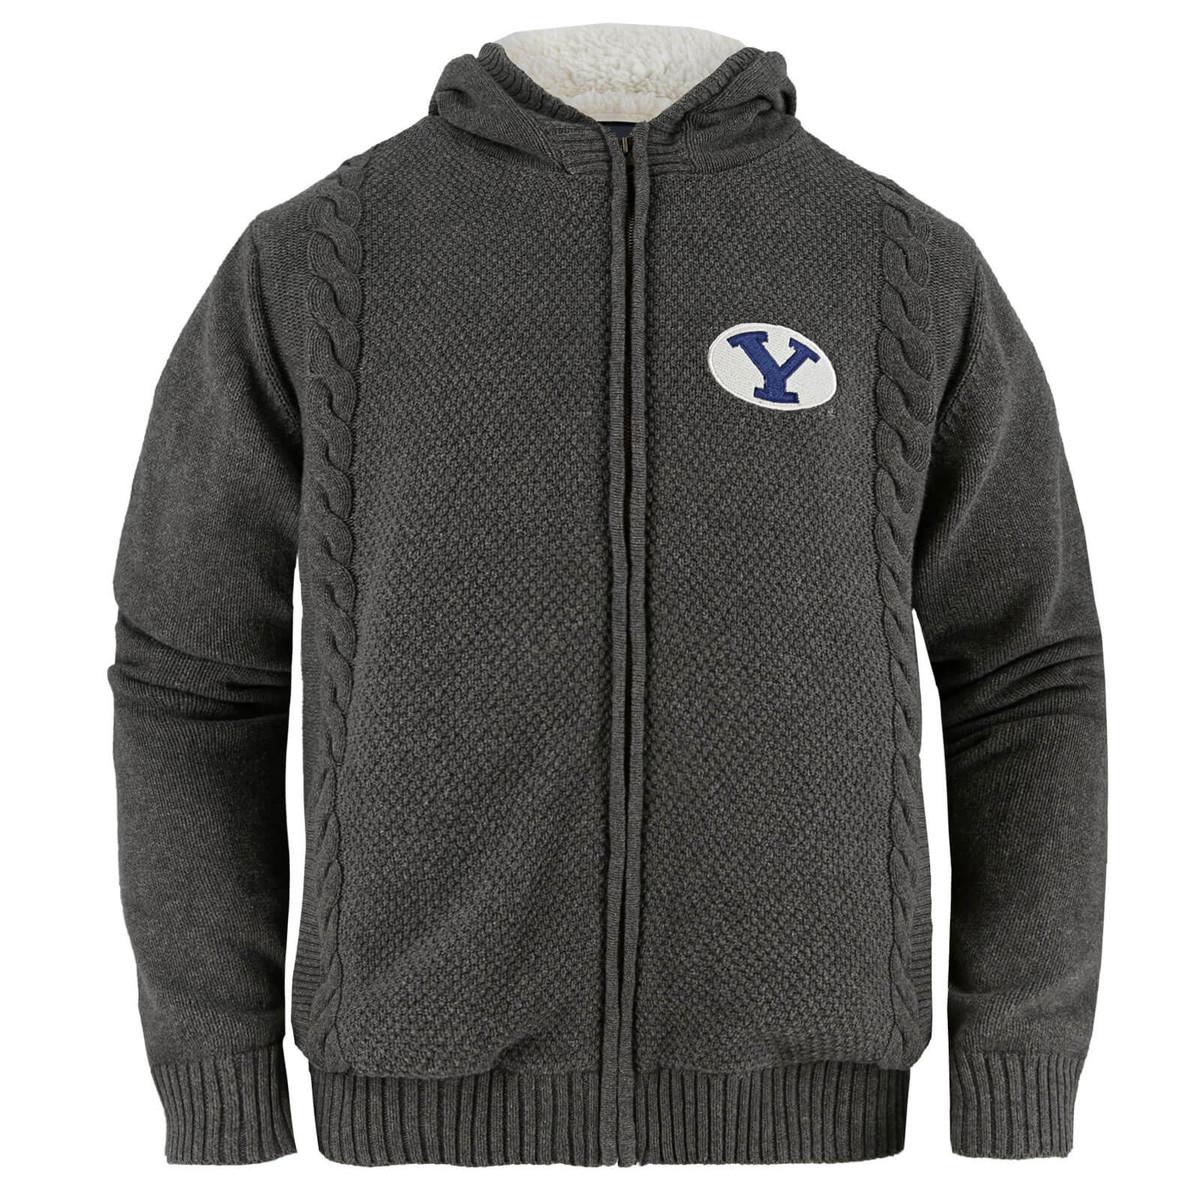 55194272704619 Men's BYU Sweatshirts & Hoodies, Official Gear